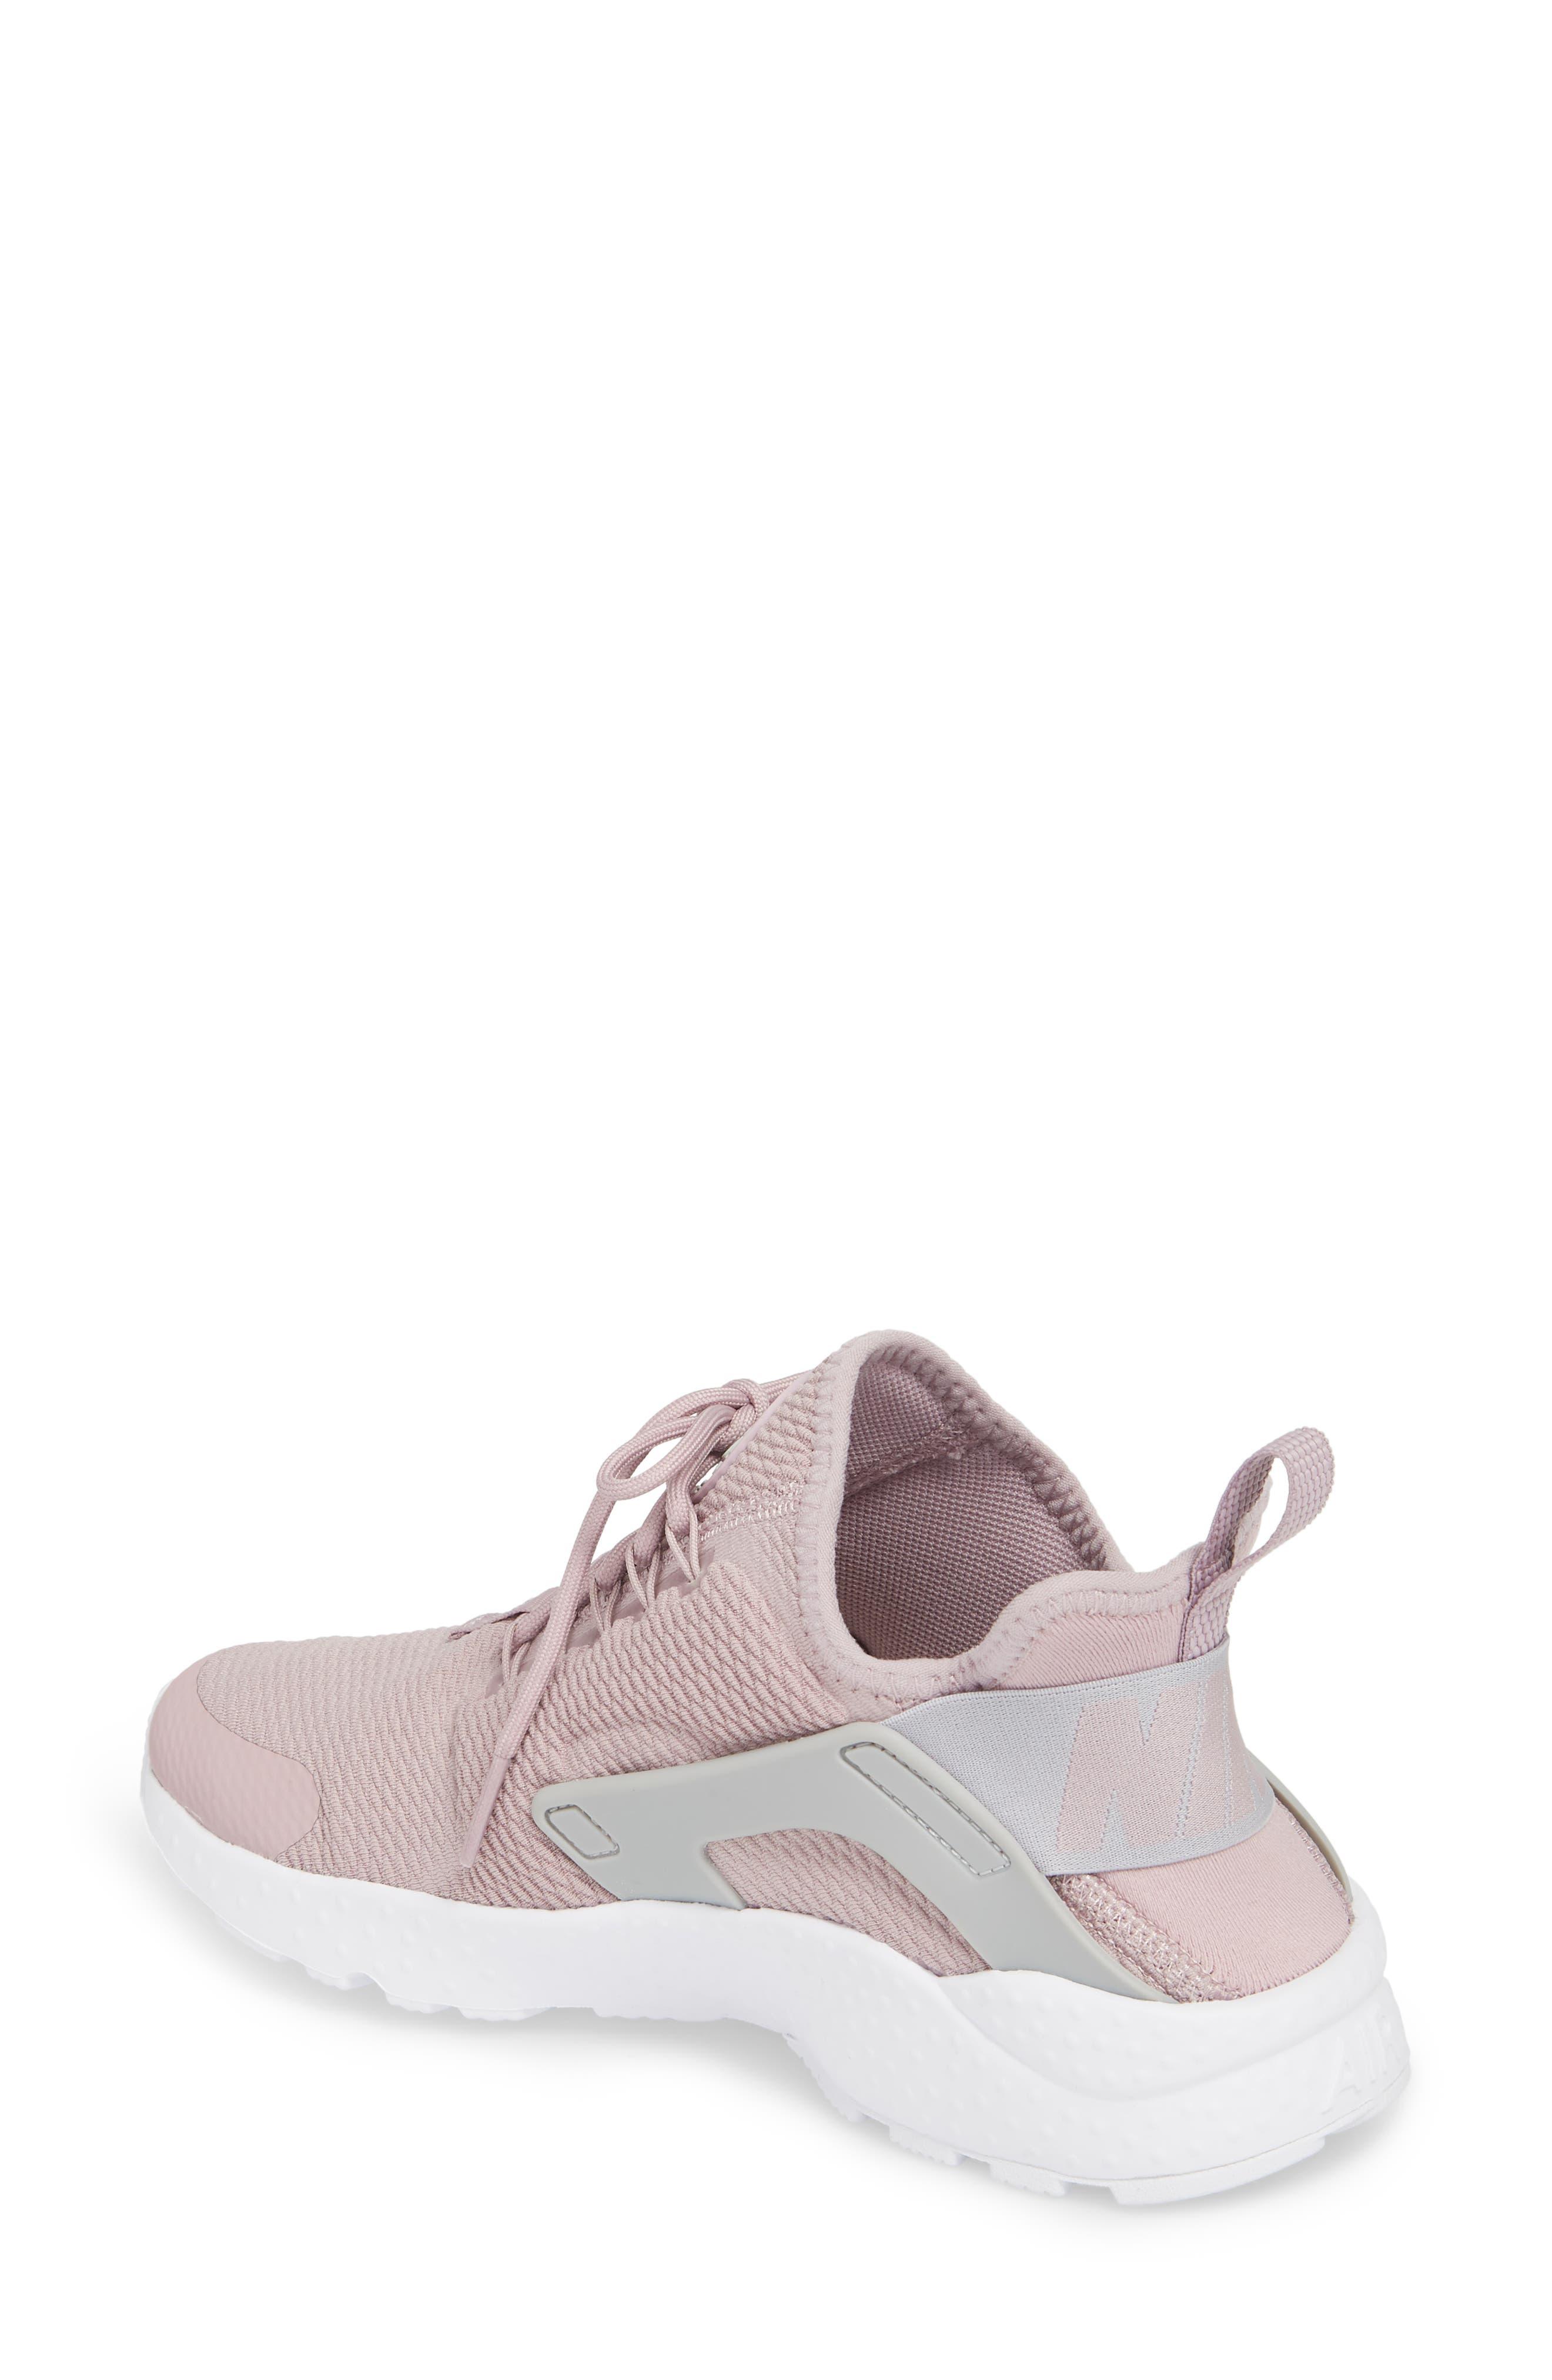 Air Huarache Sneaker,                             Alternate thumbnail 44, color,